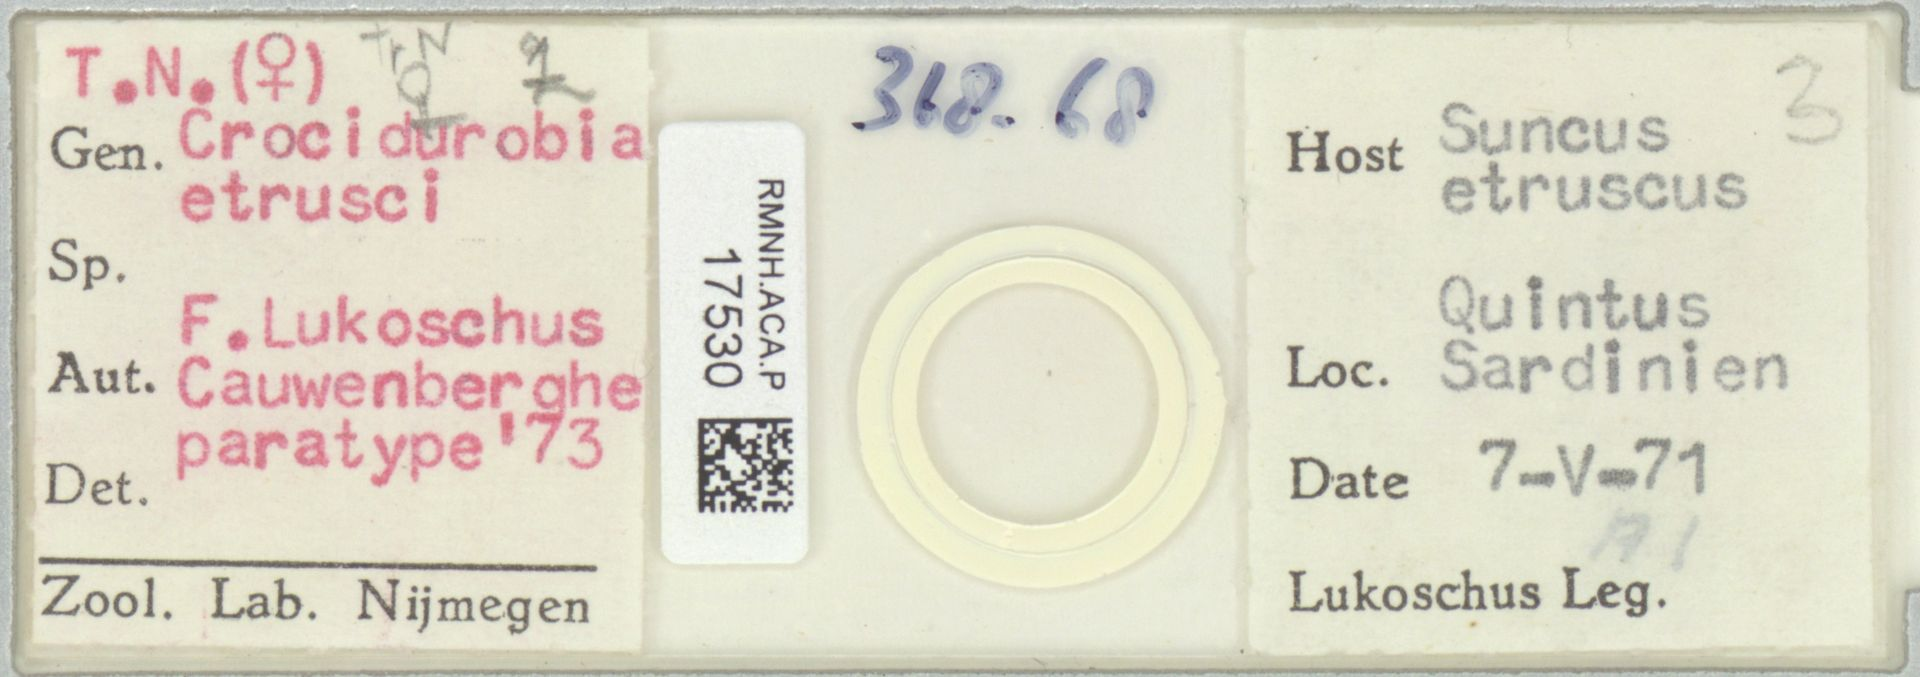 RMNH.ACA.P.17530 | Crocidurobia etrusci F. Lukoschus, Cauwenberghe